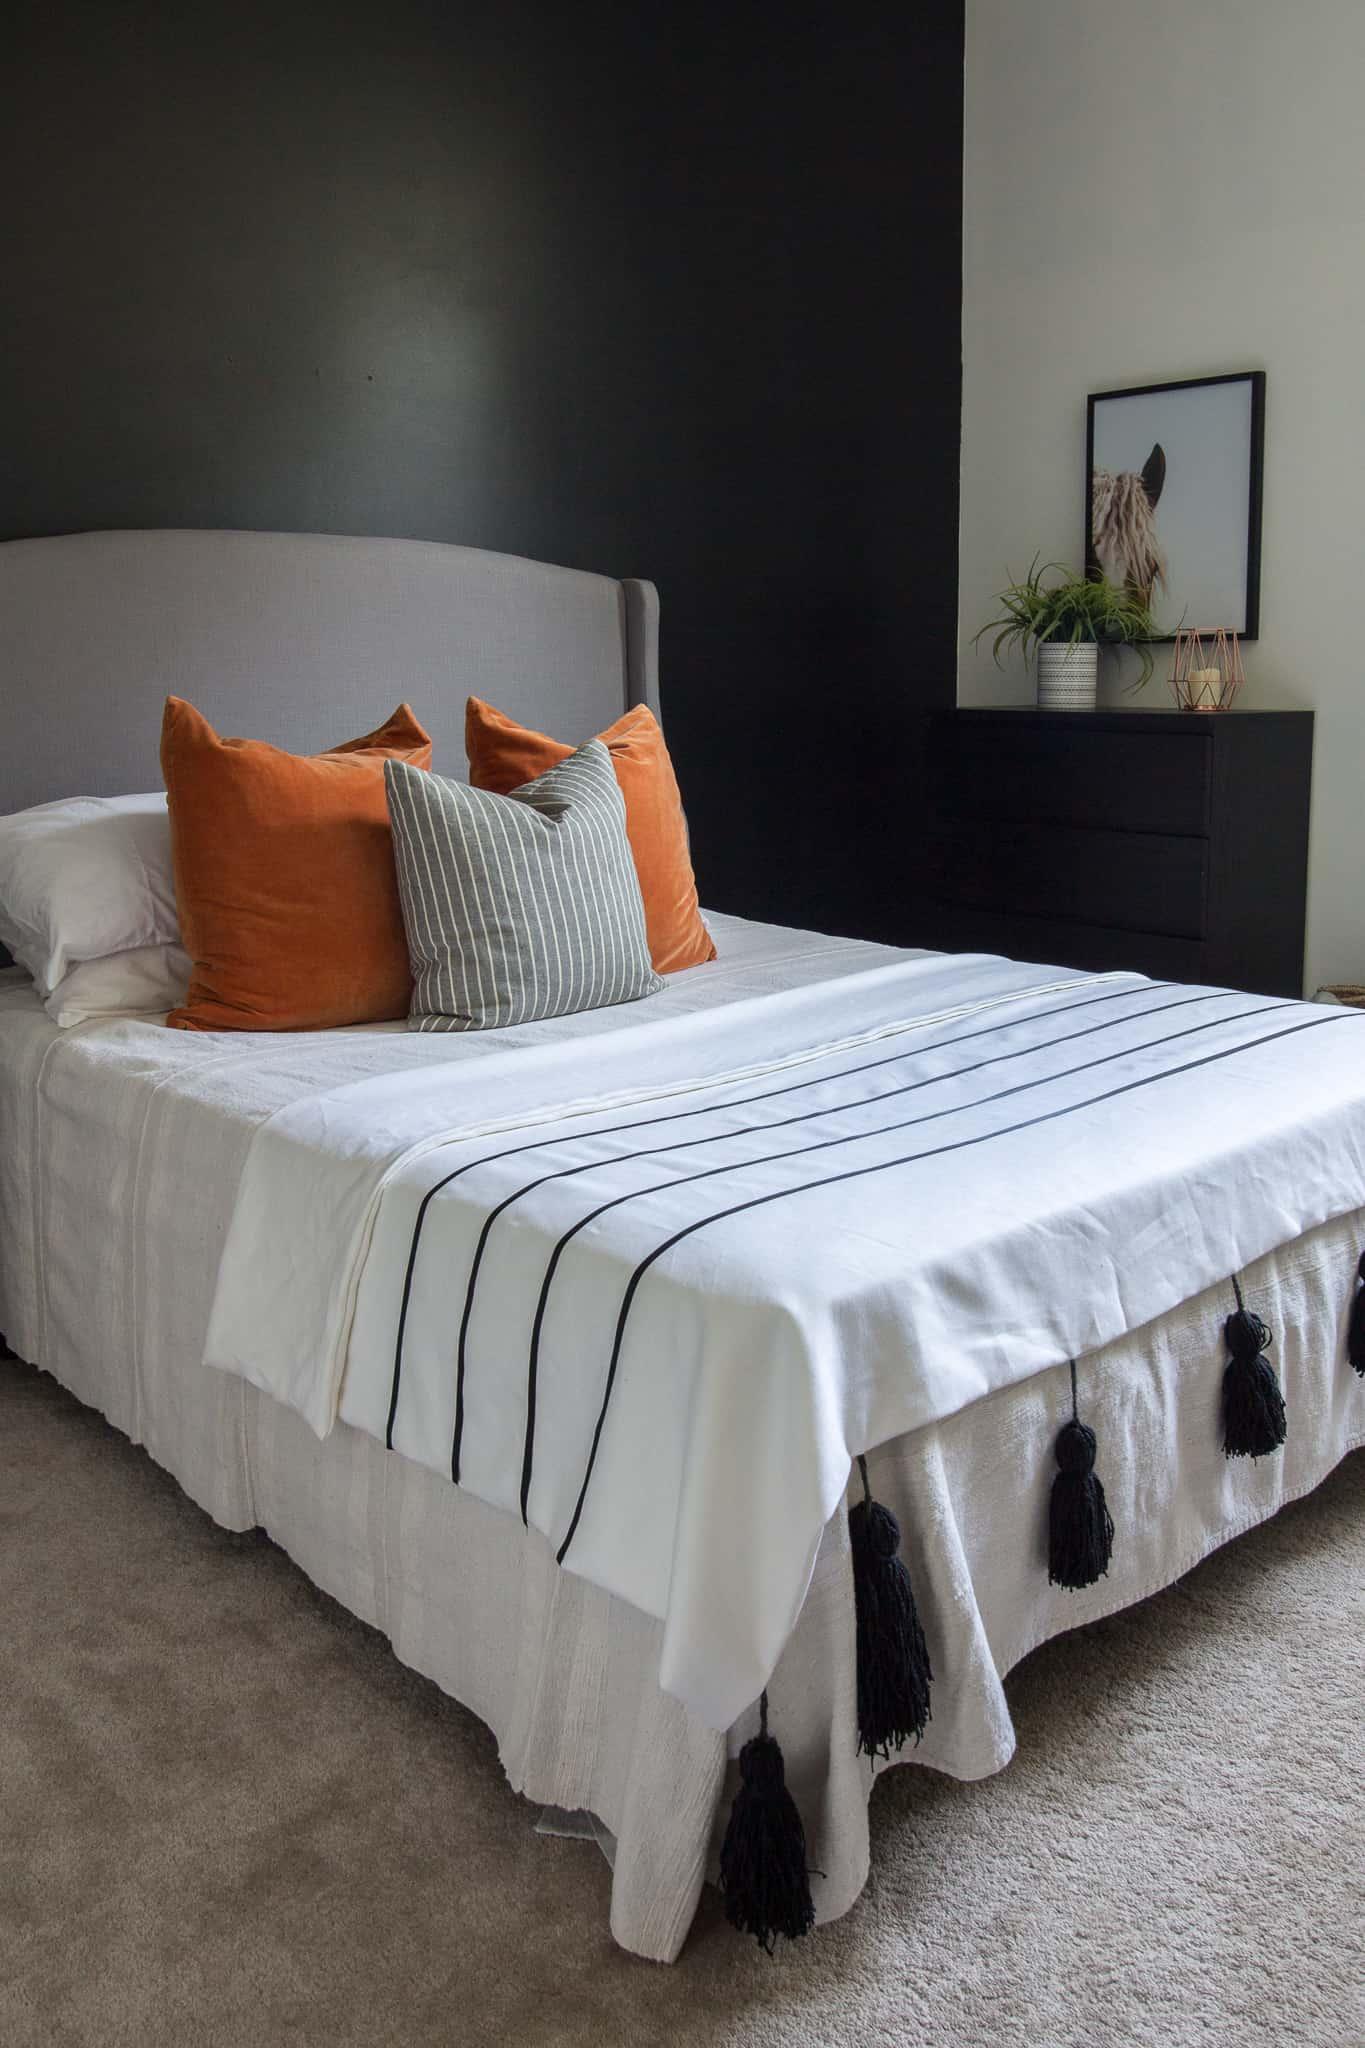 DIY throw blanket for the $100 Room |C|hallenge